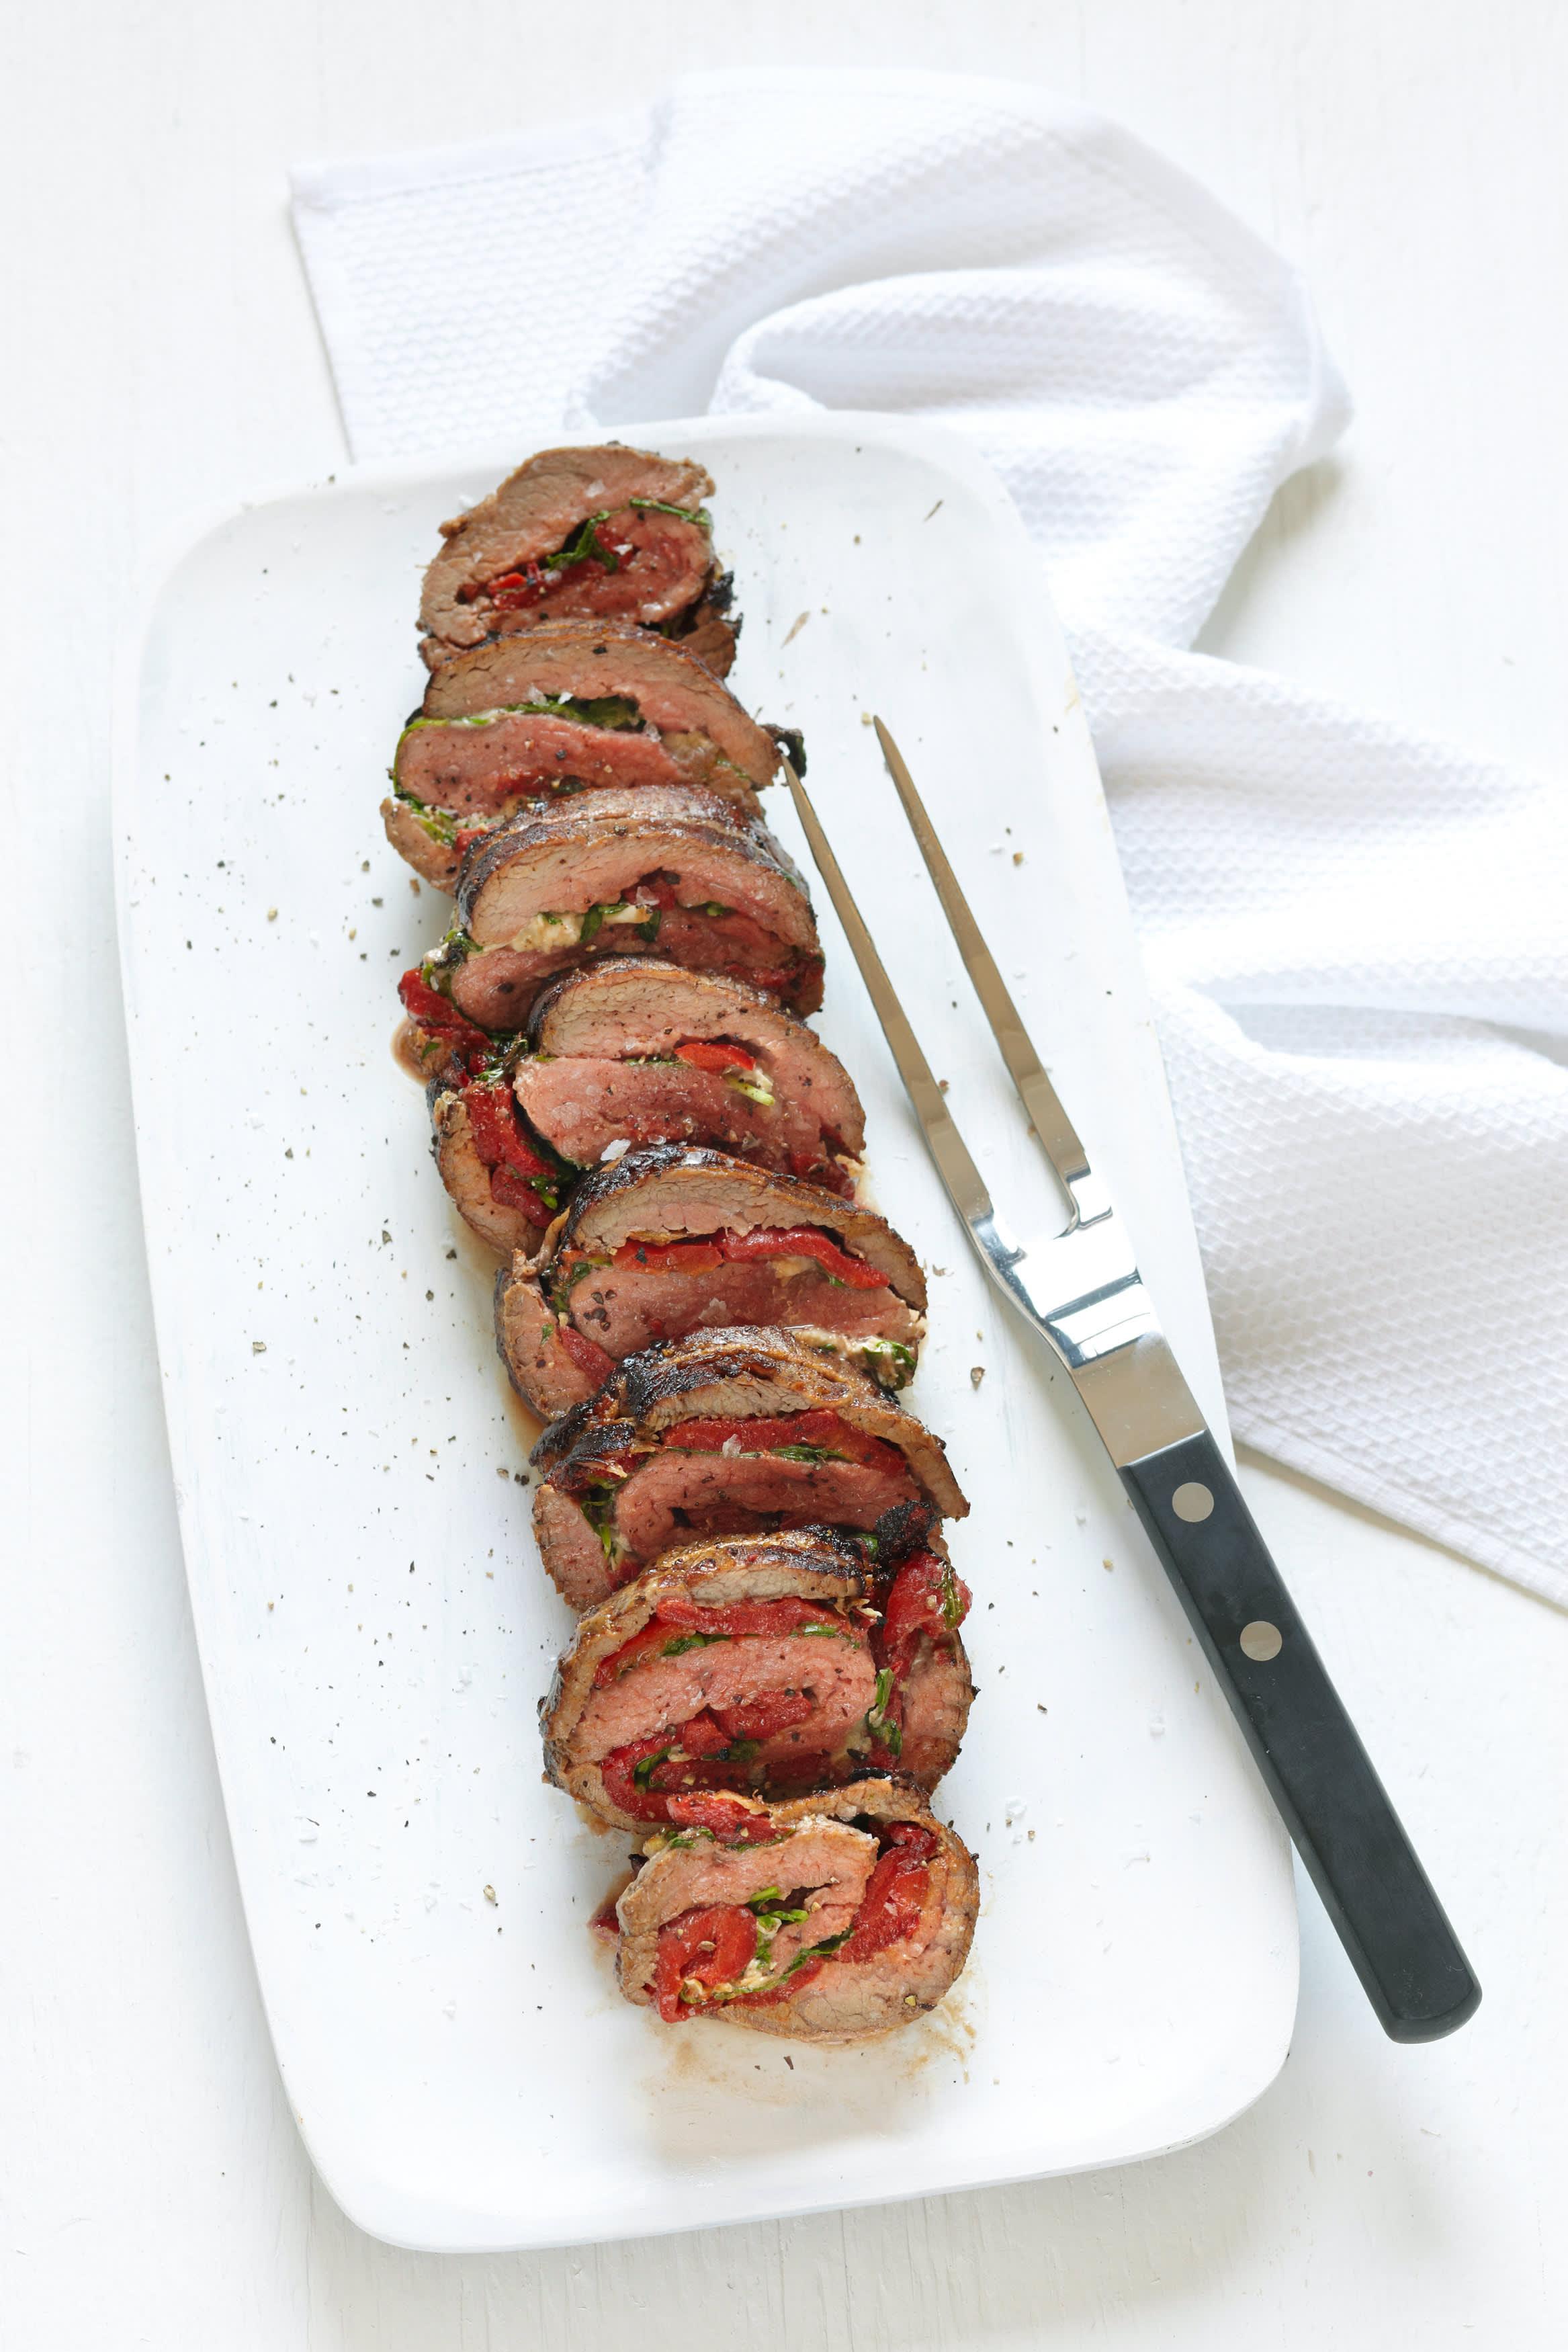 The Best Way to Reheat a Steak   Kitchn